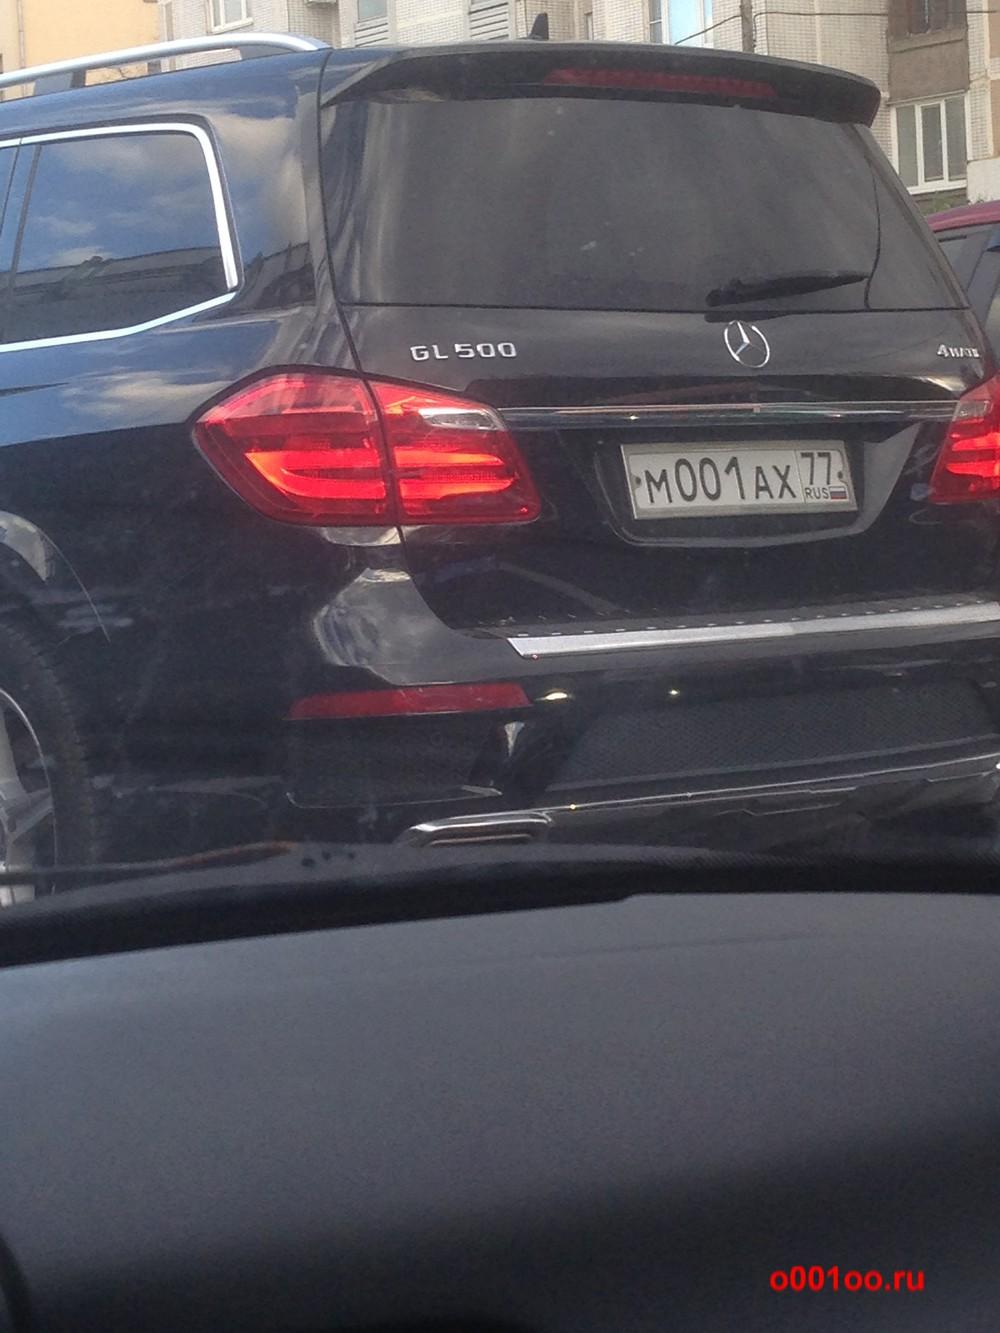 м001ах77